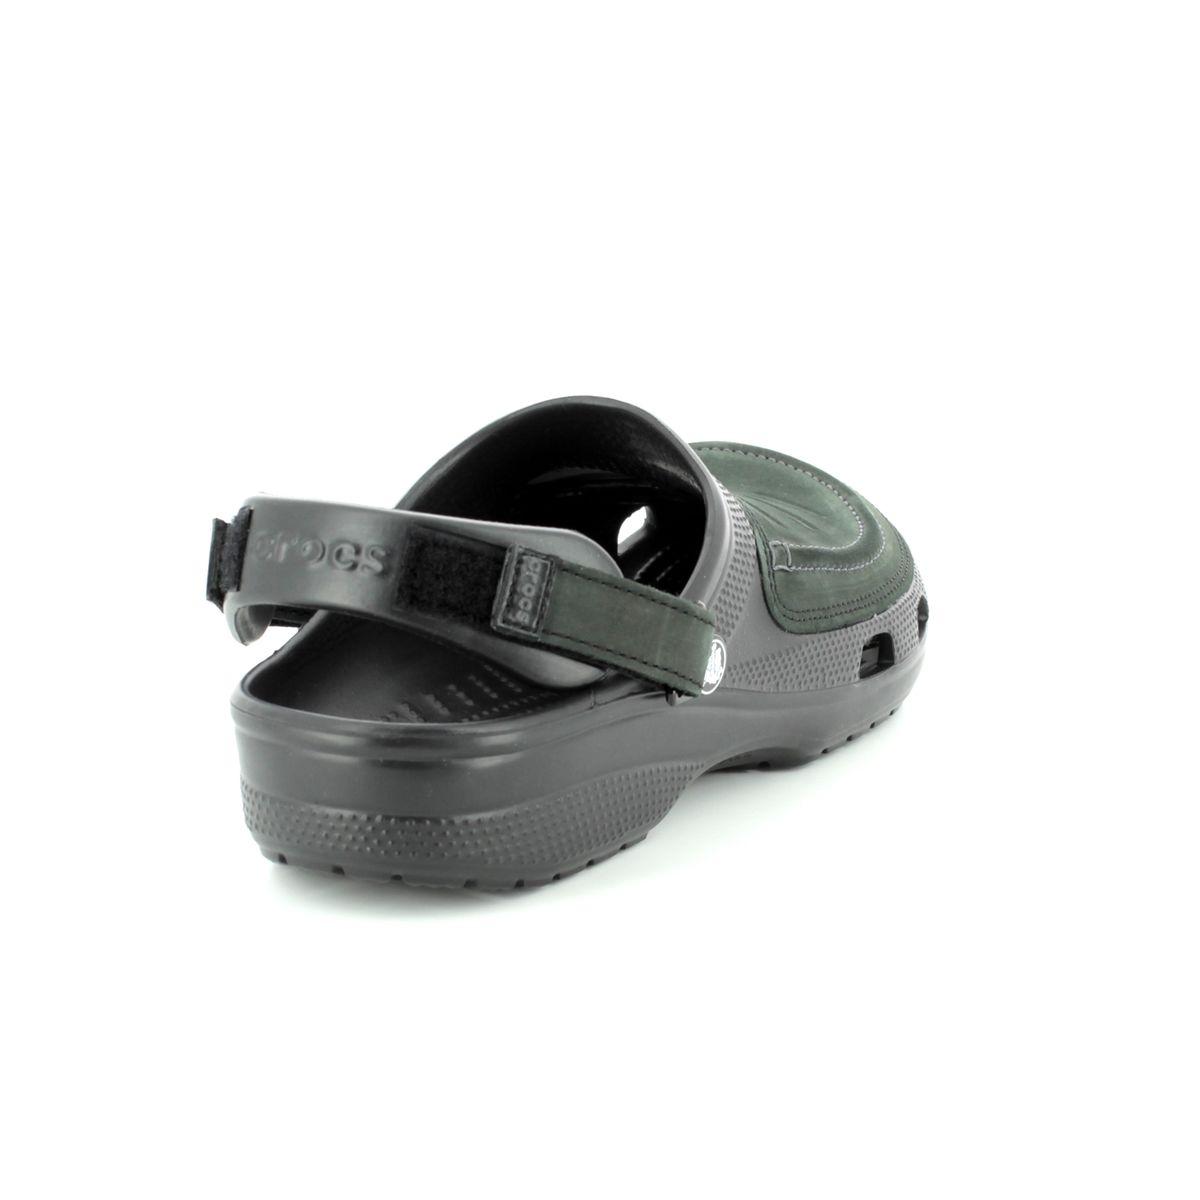 6c93cceae6dfc Crocs Sandals - Black - 205177/060 YUKON VISTA